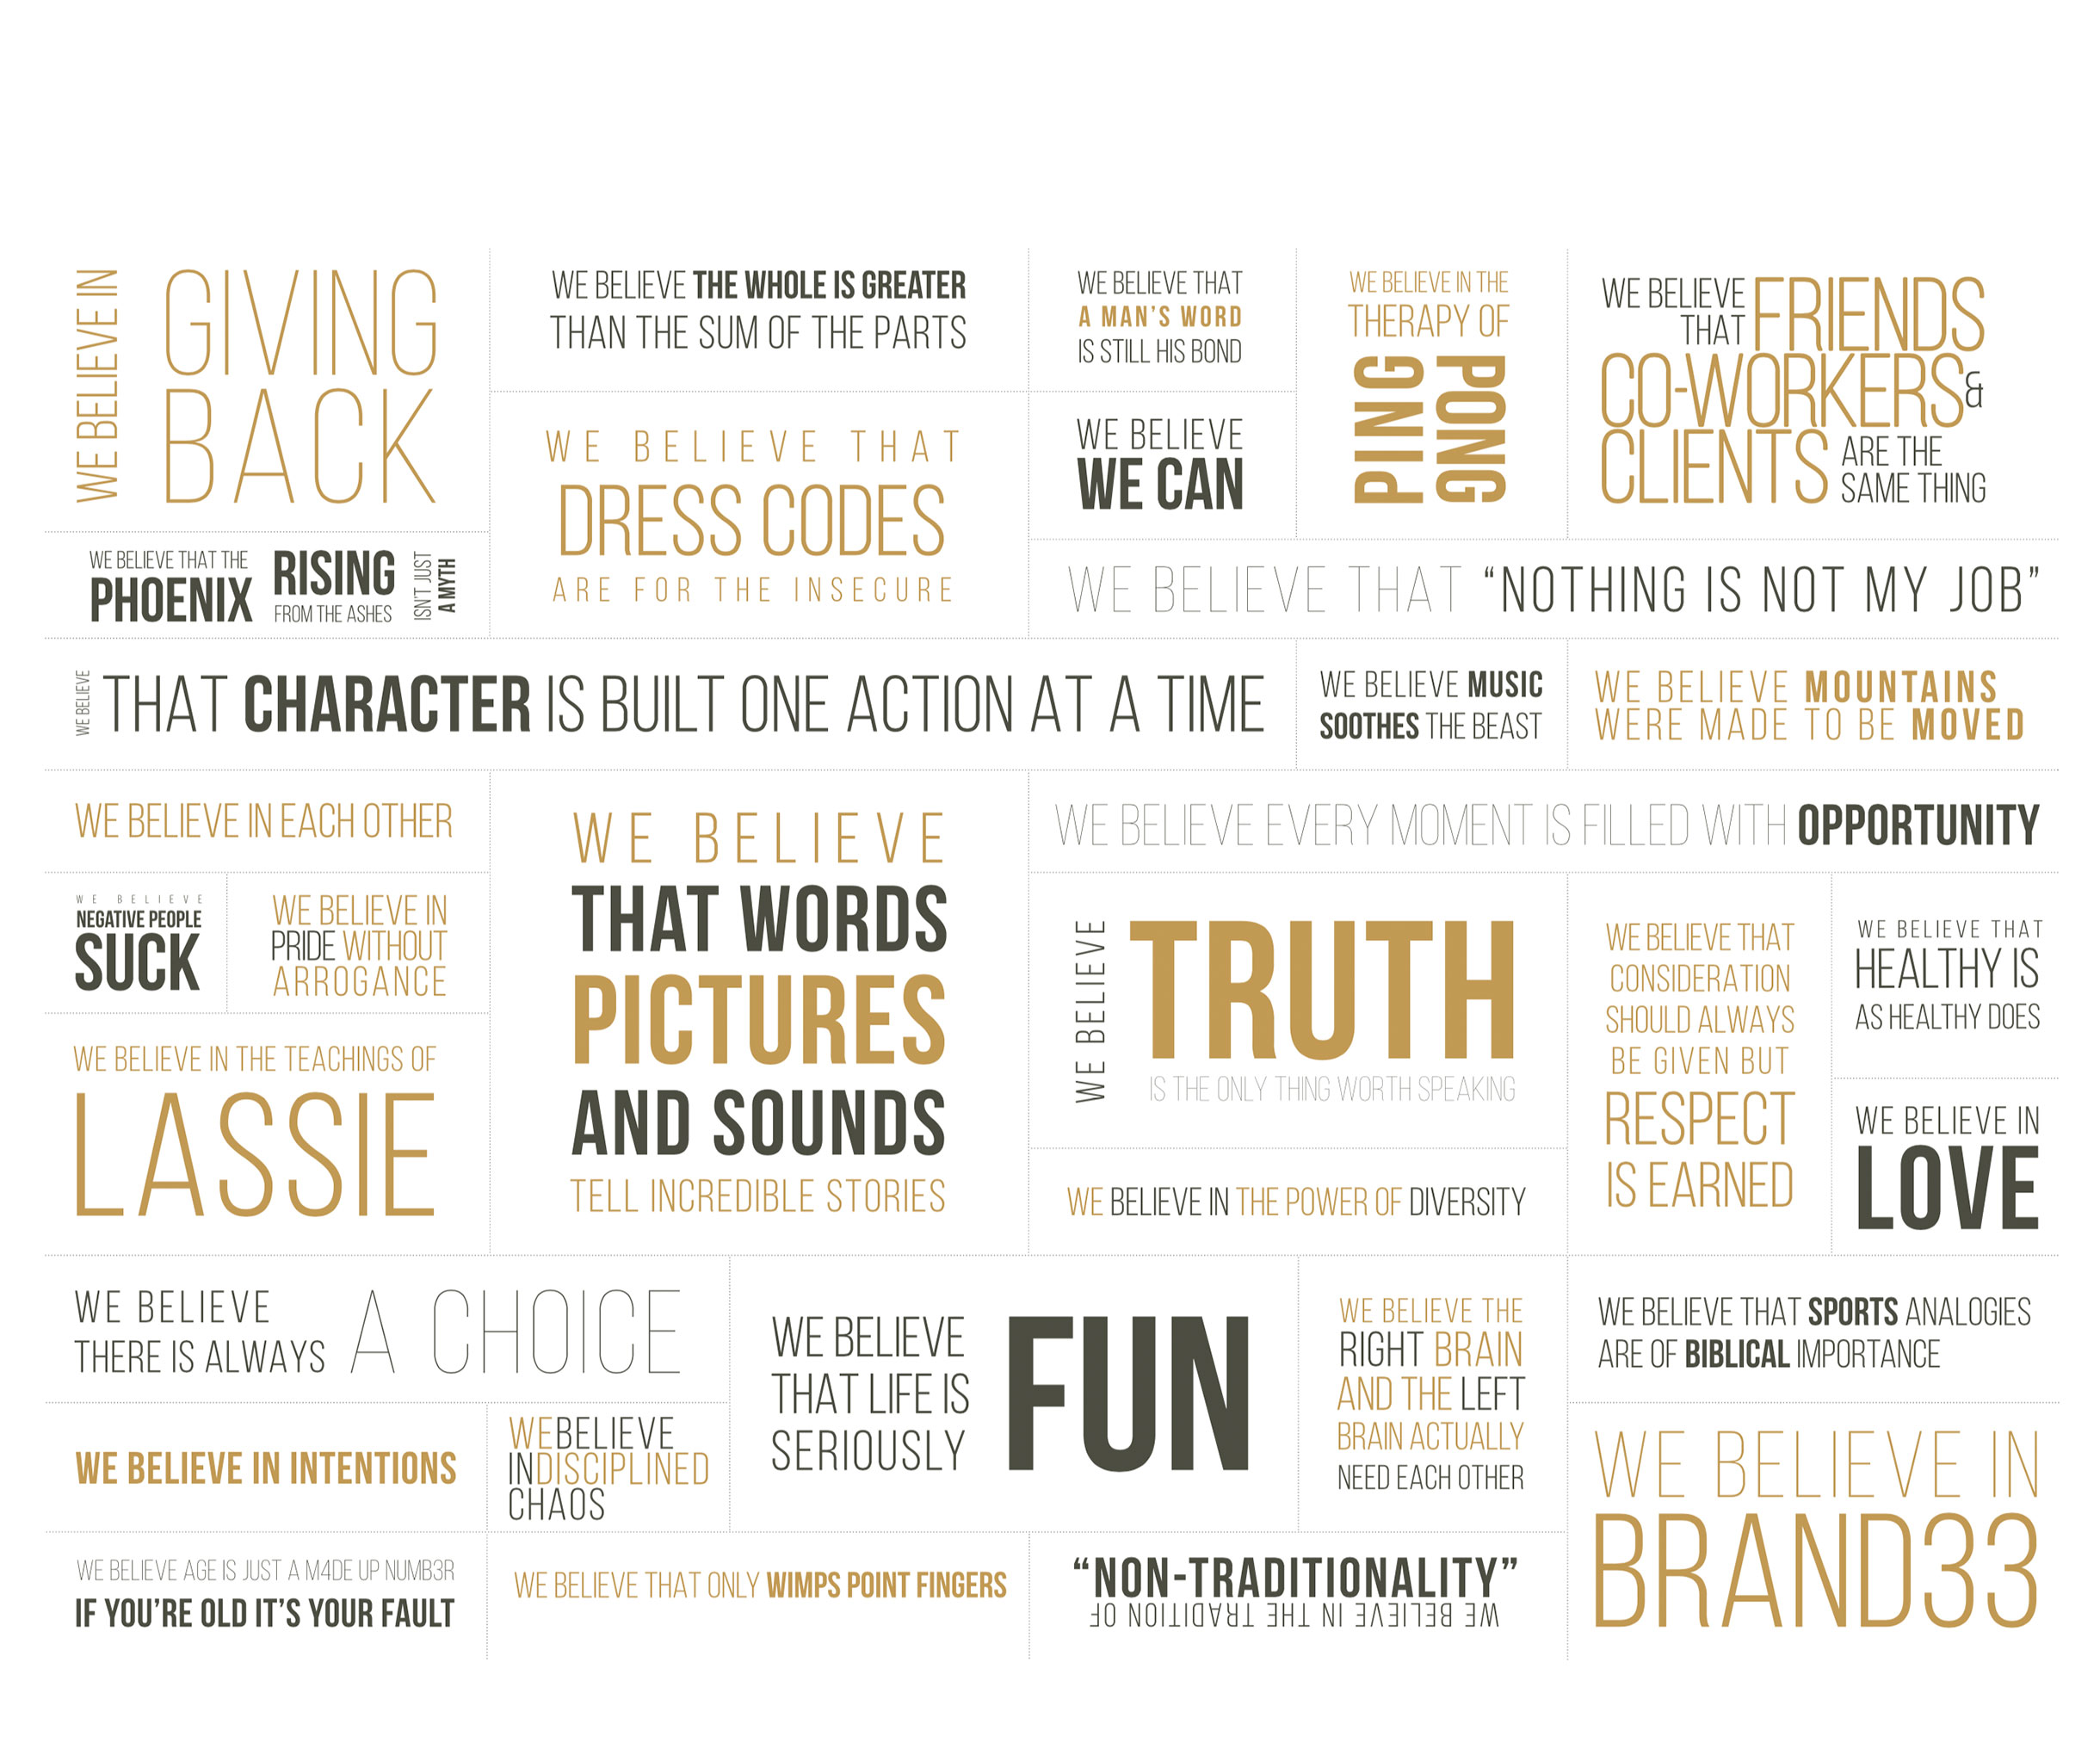 Brand 33 Manifesto